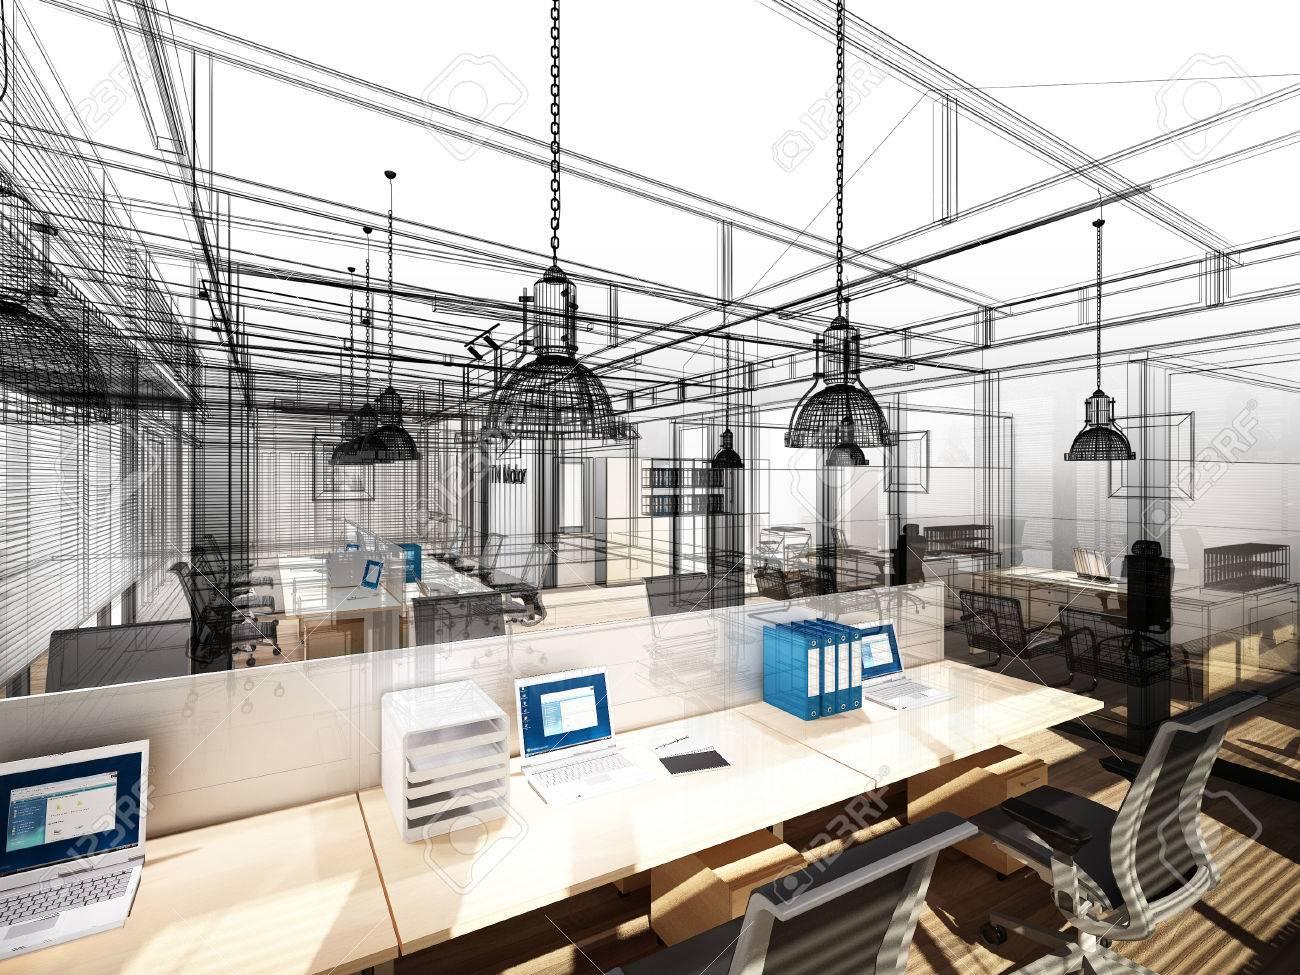 sketch design of interior office, 3d interior wire frame - 60619613